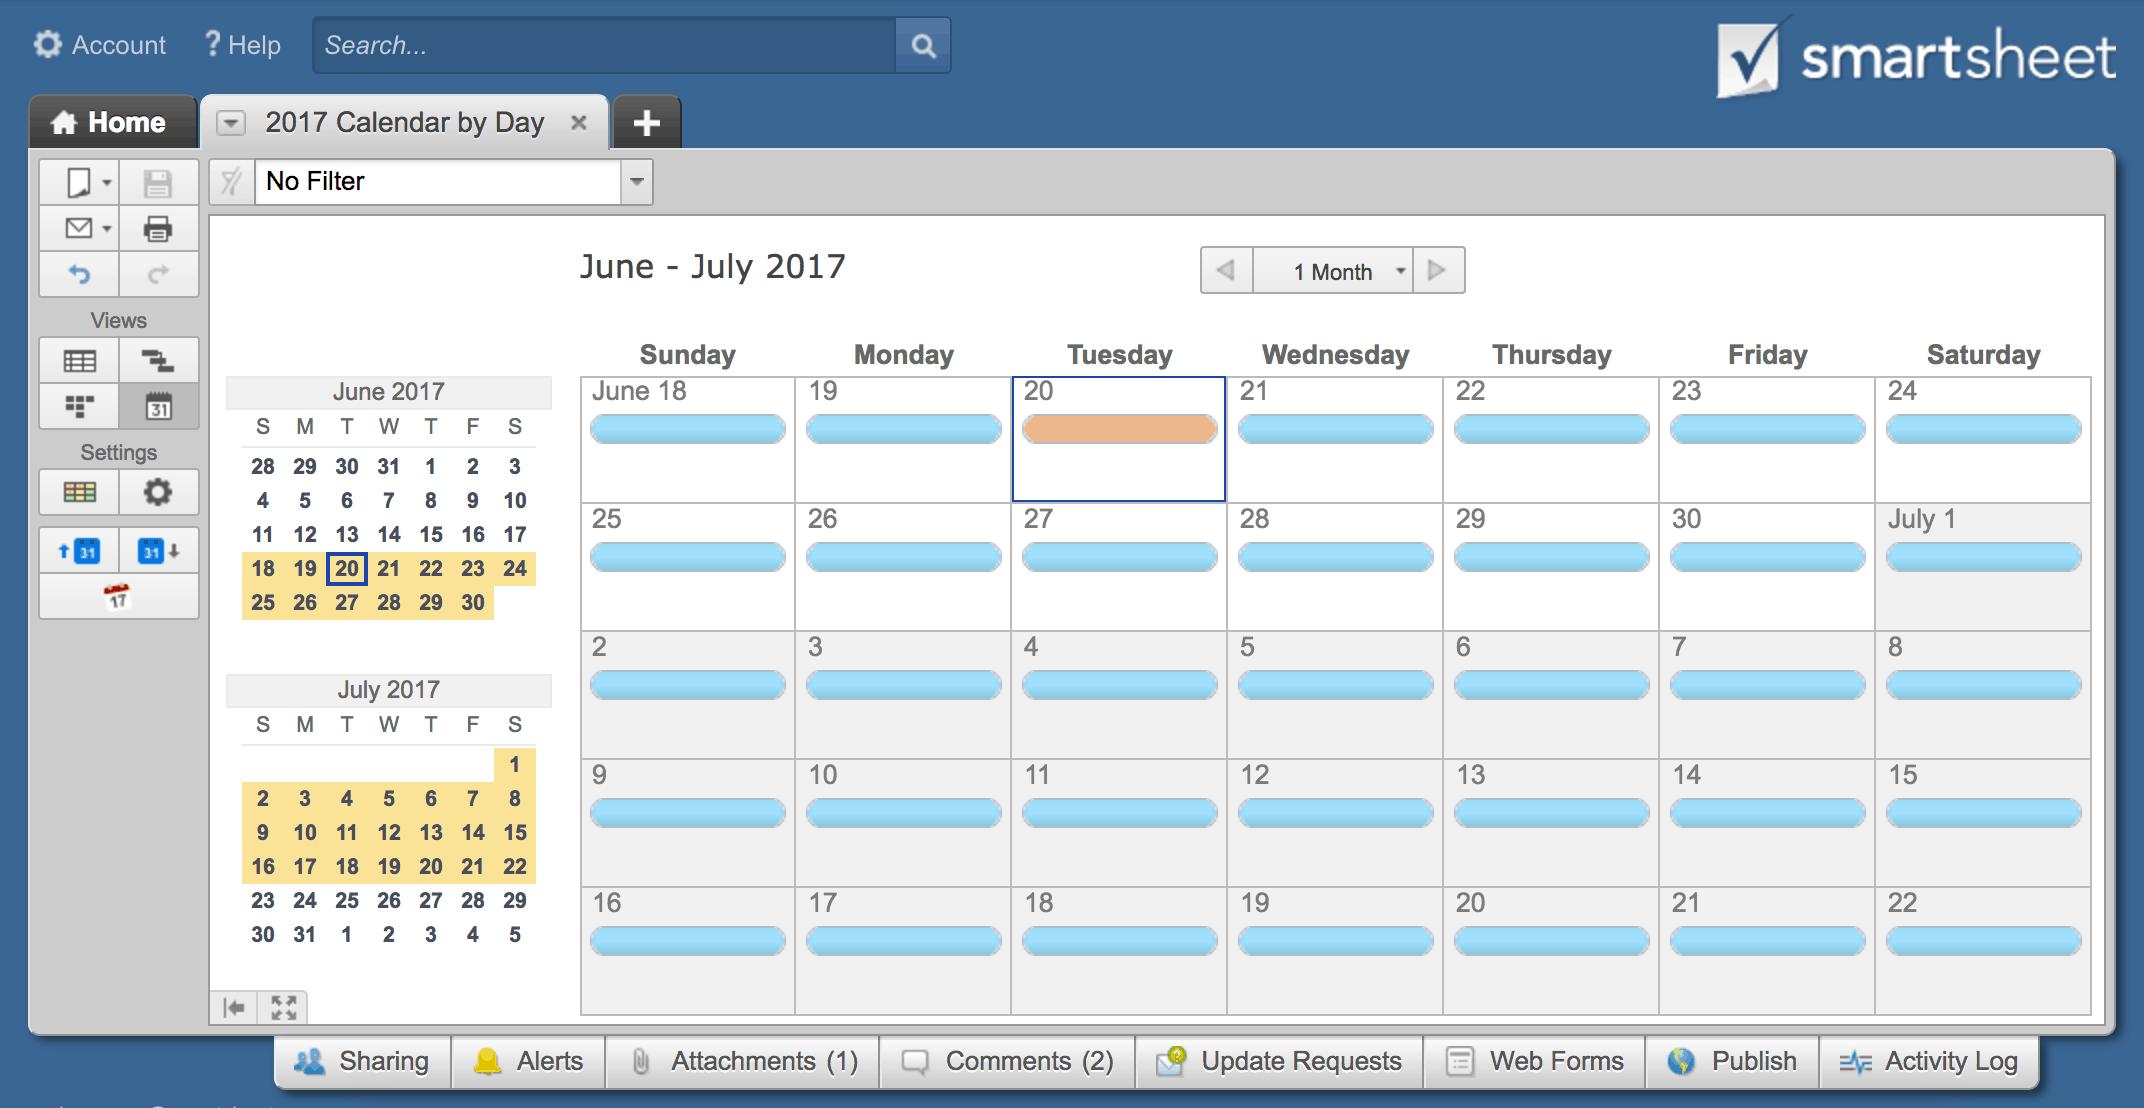 smartsheet daily calendar in calendar view